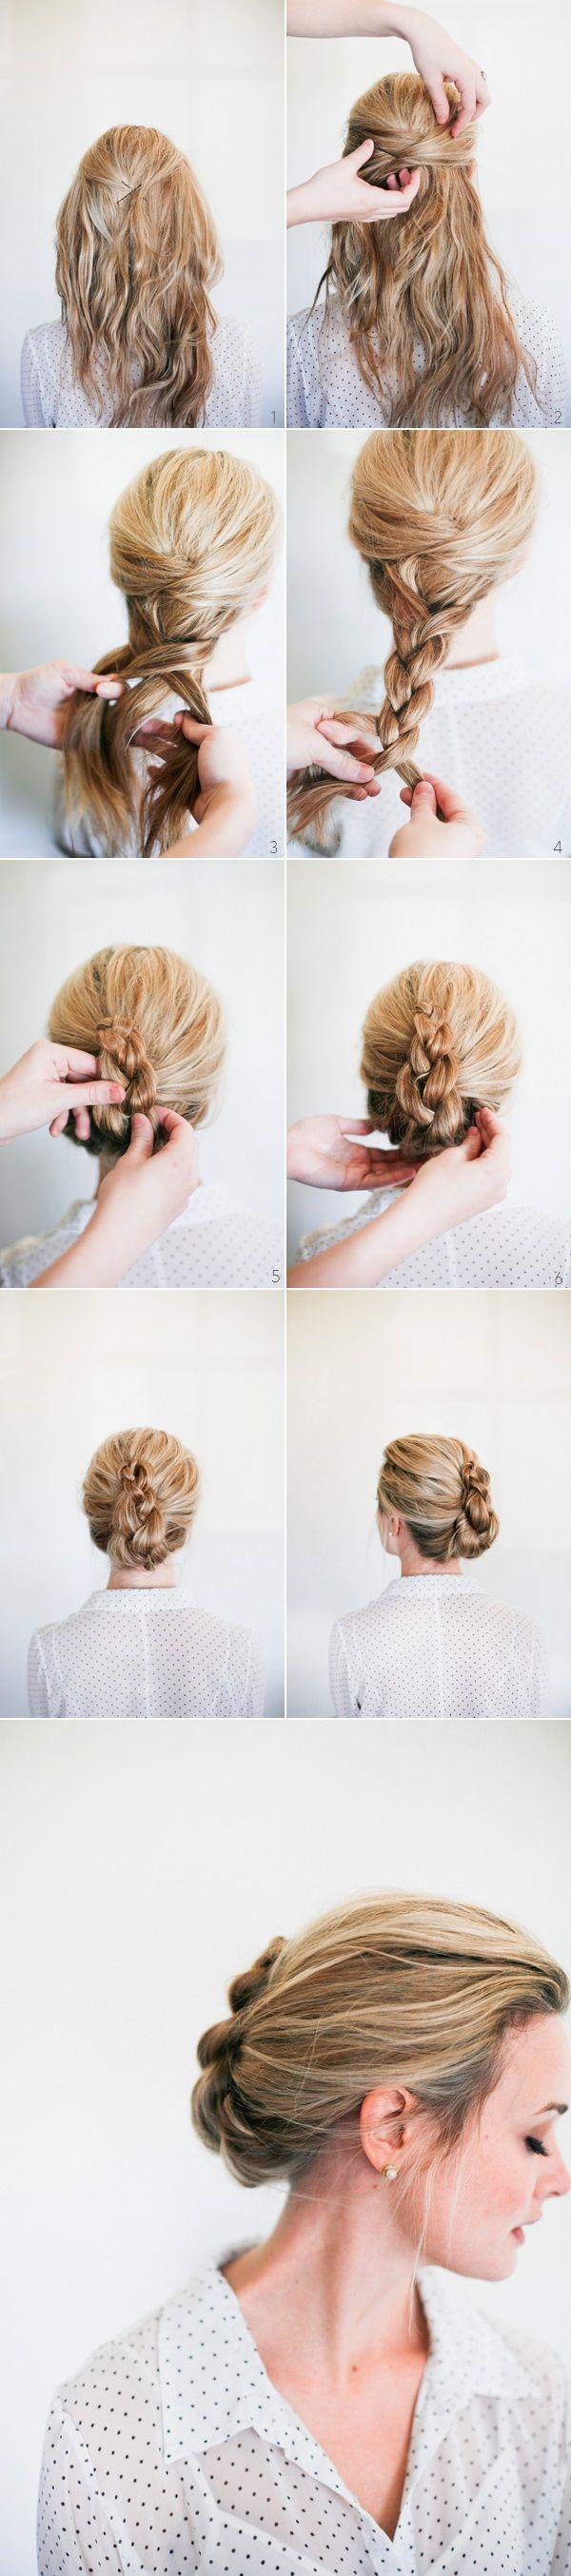 Wedding Hairstyle Tutorial: Romantic Braided French Twist